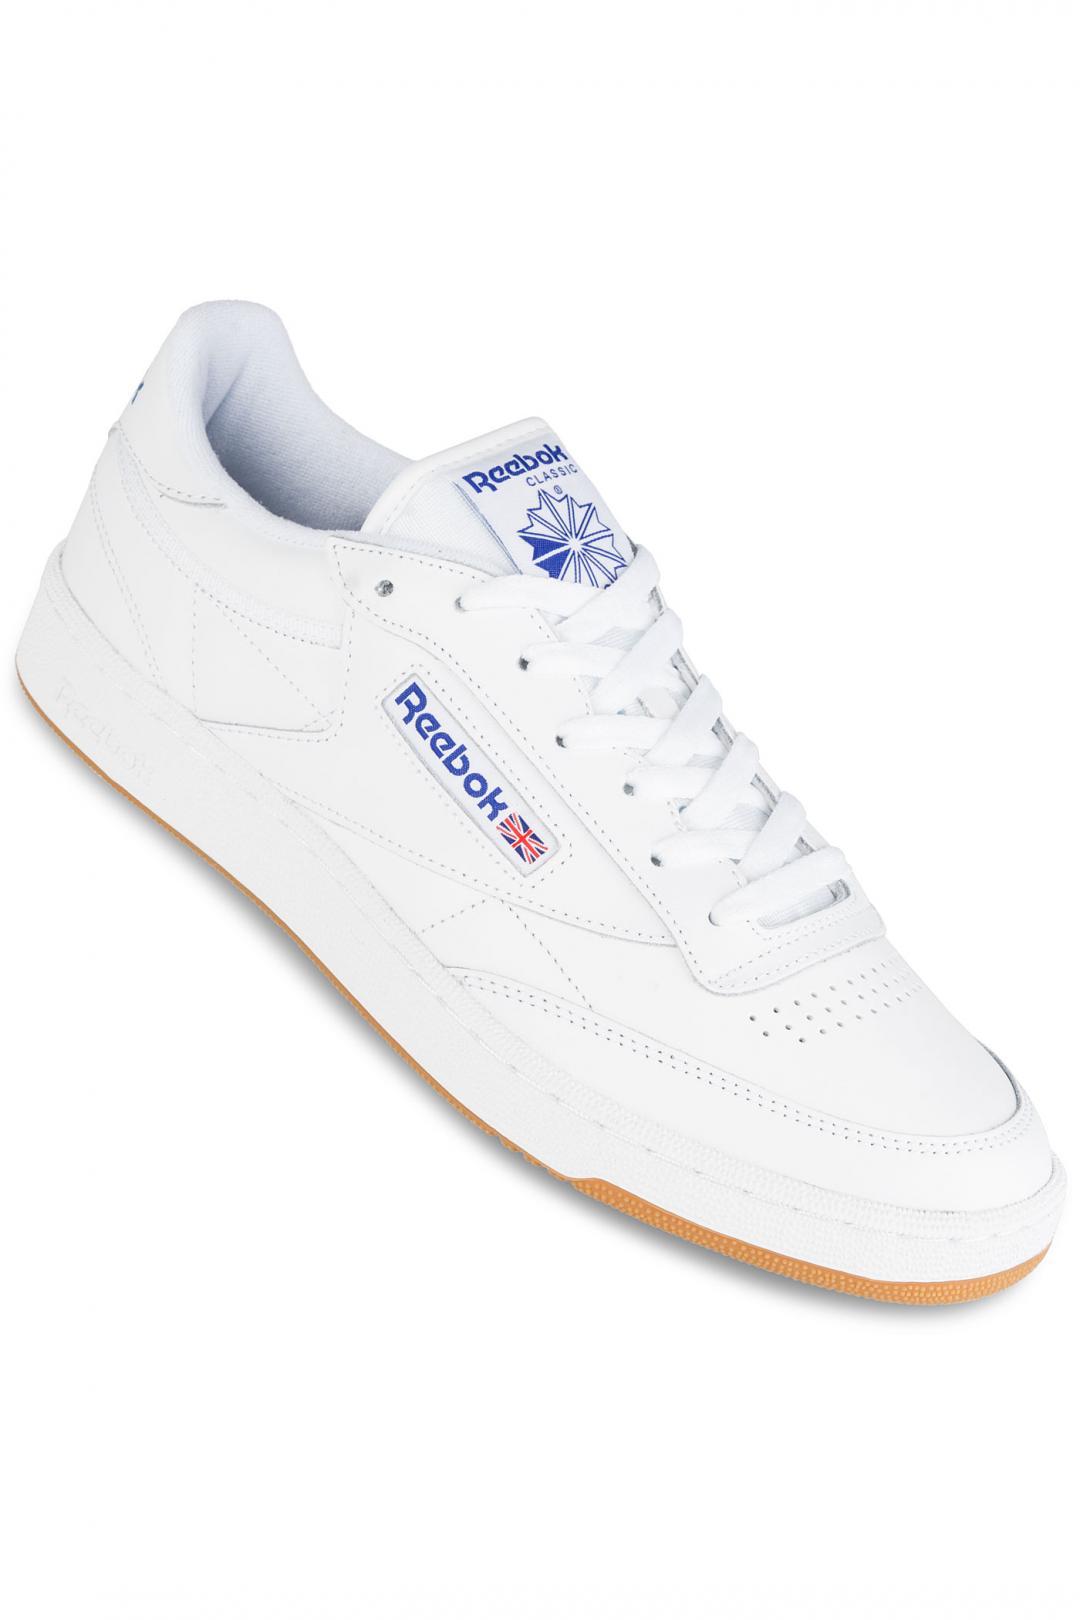 Uomo Reebok Club C 85 white royal gum   Sneaker